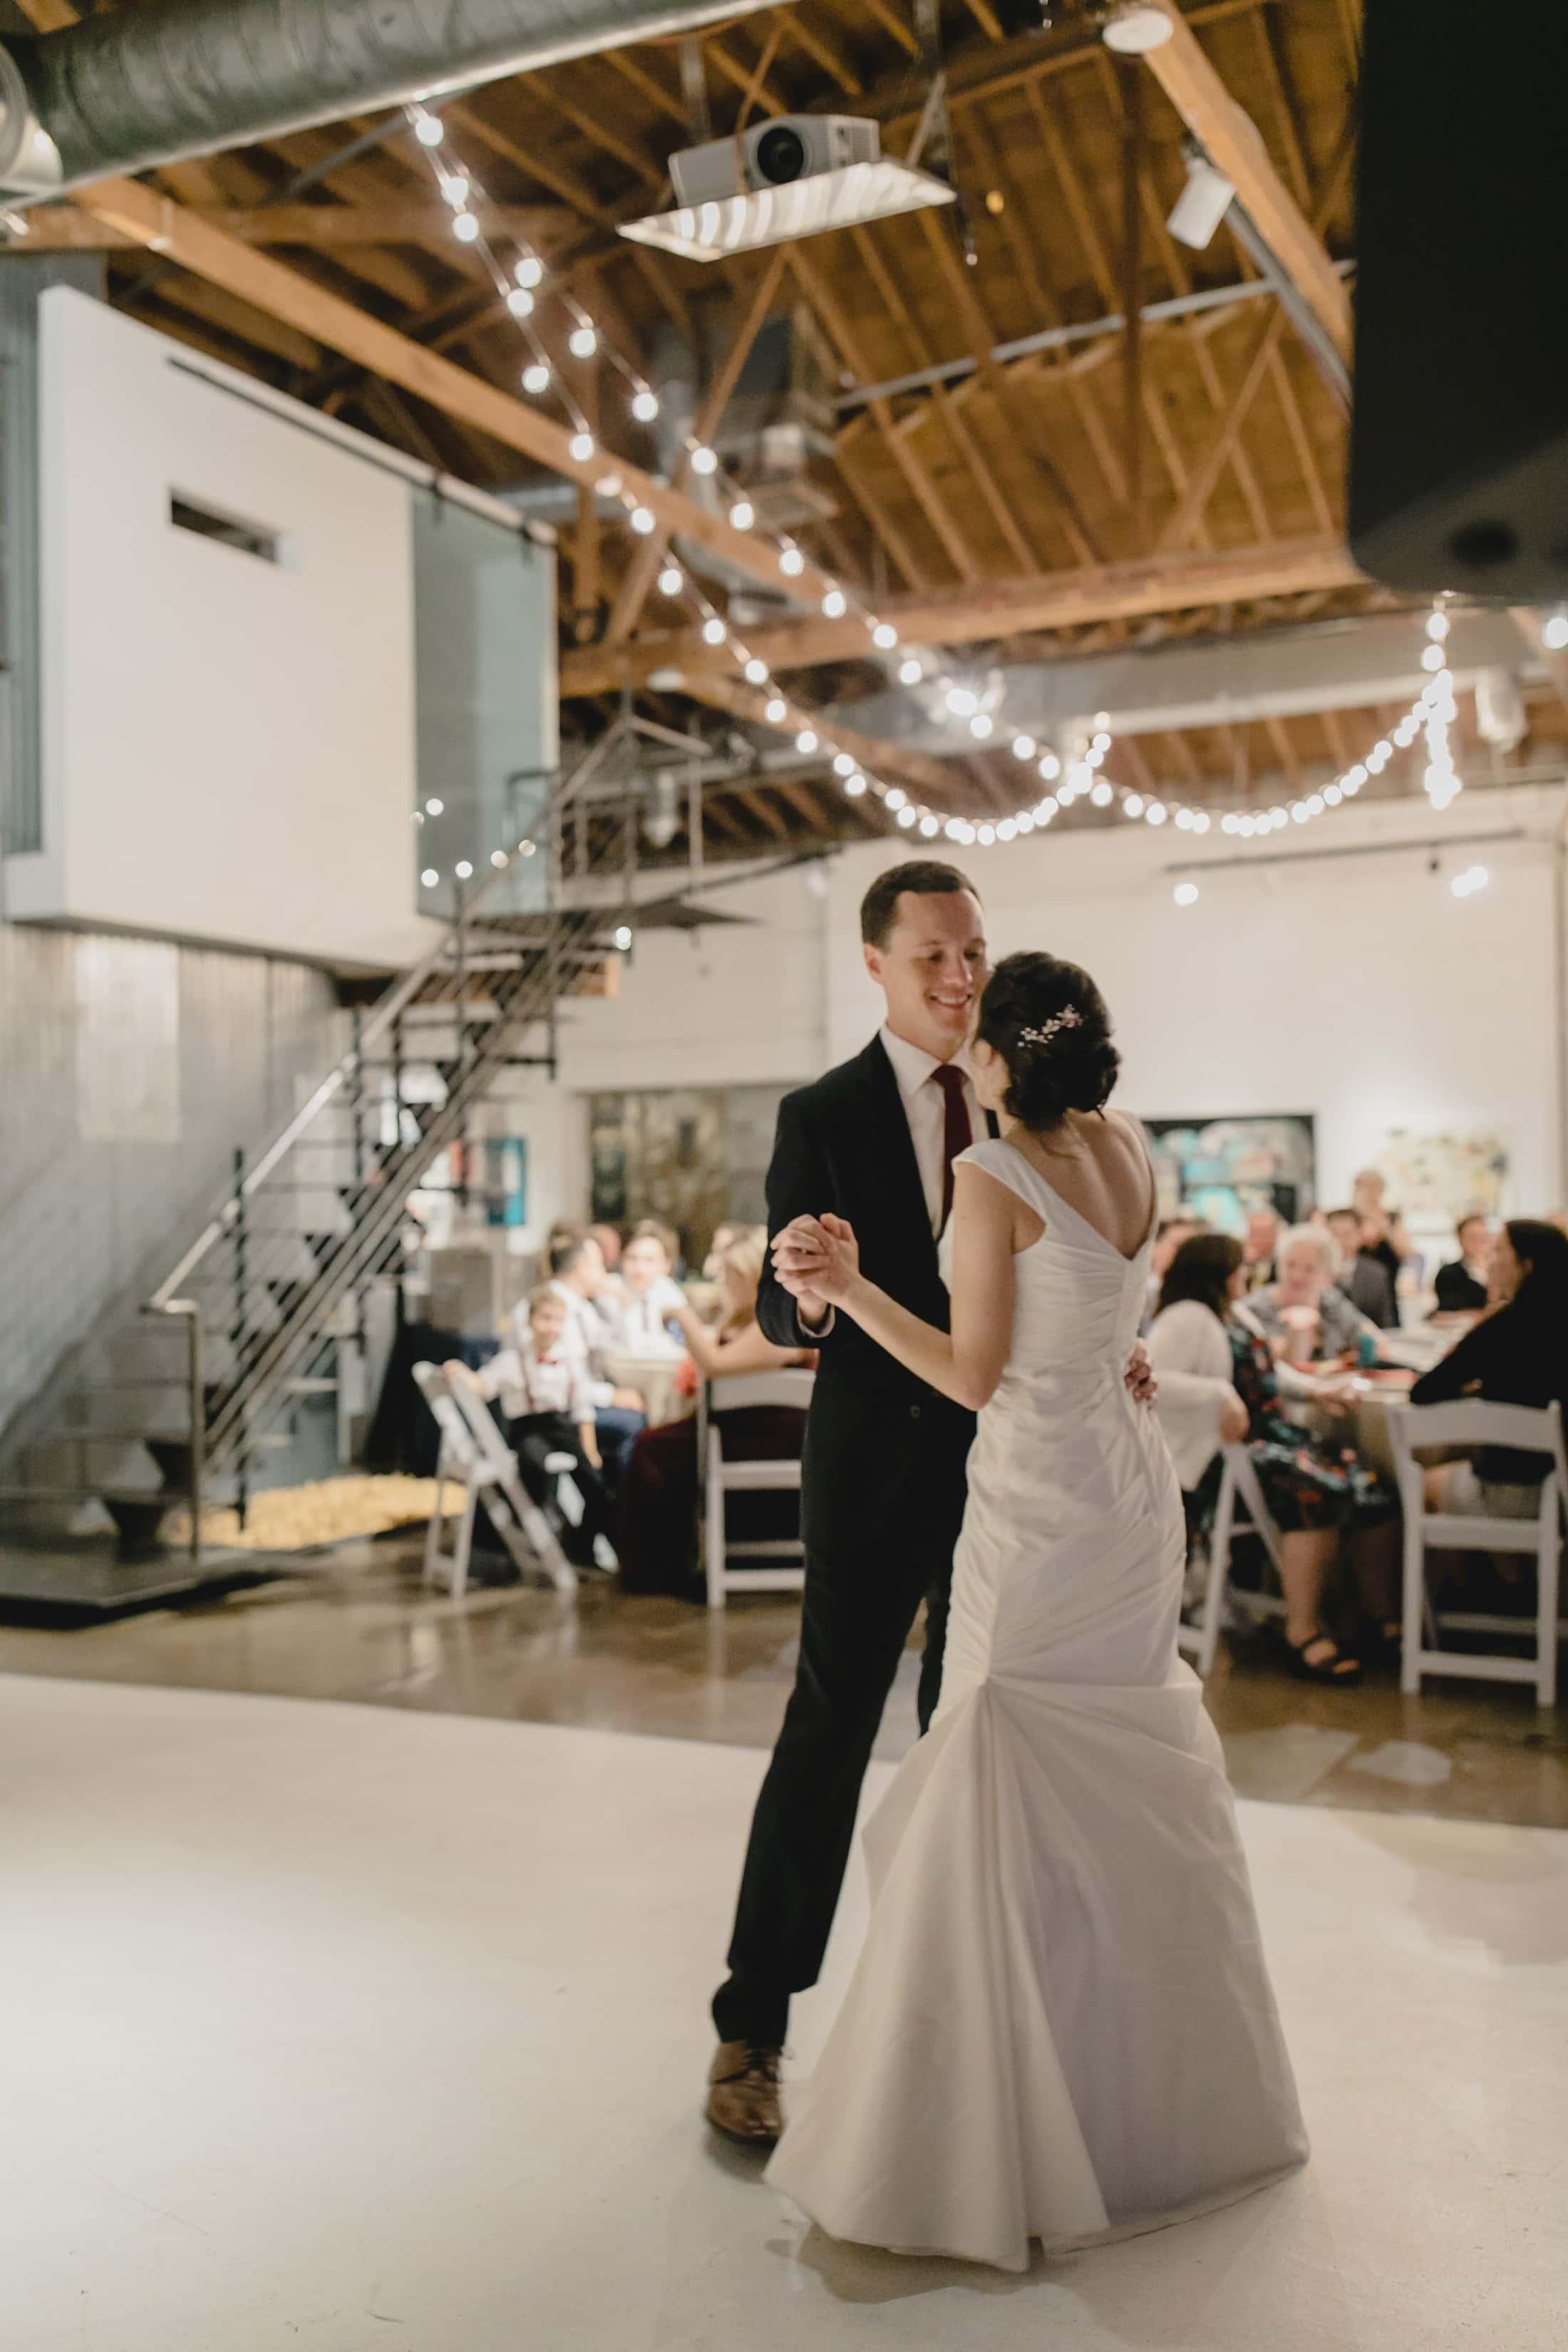 Monorchid wedding reception photos